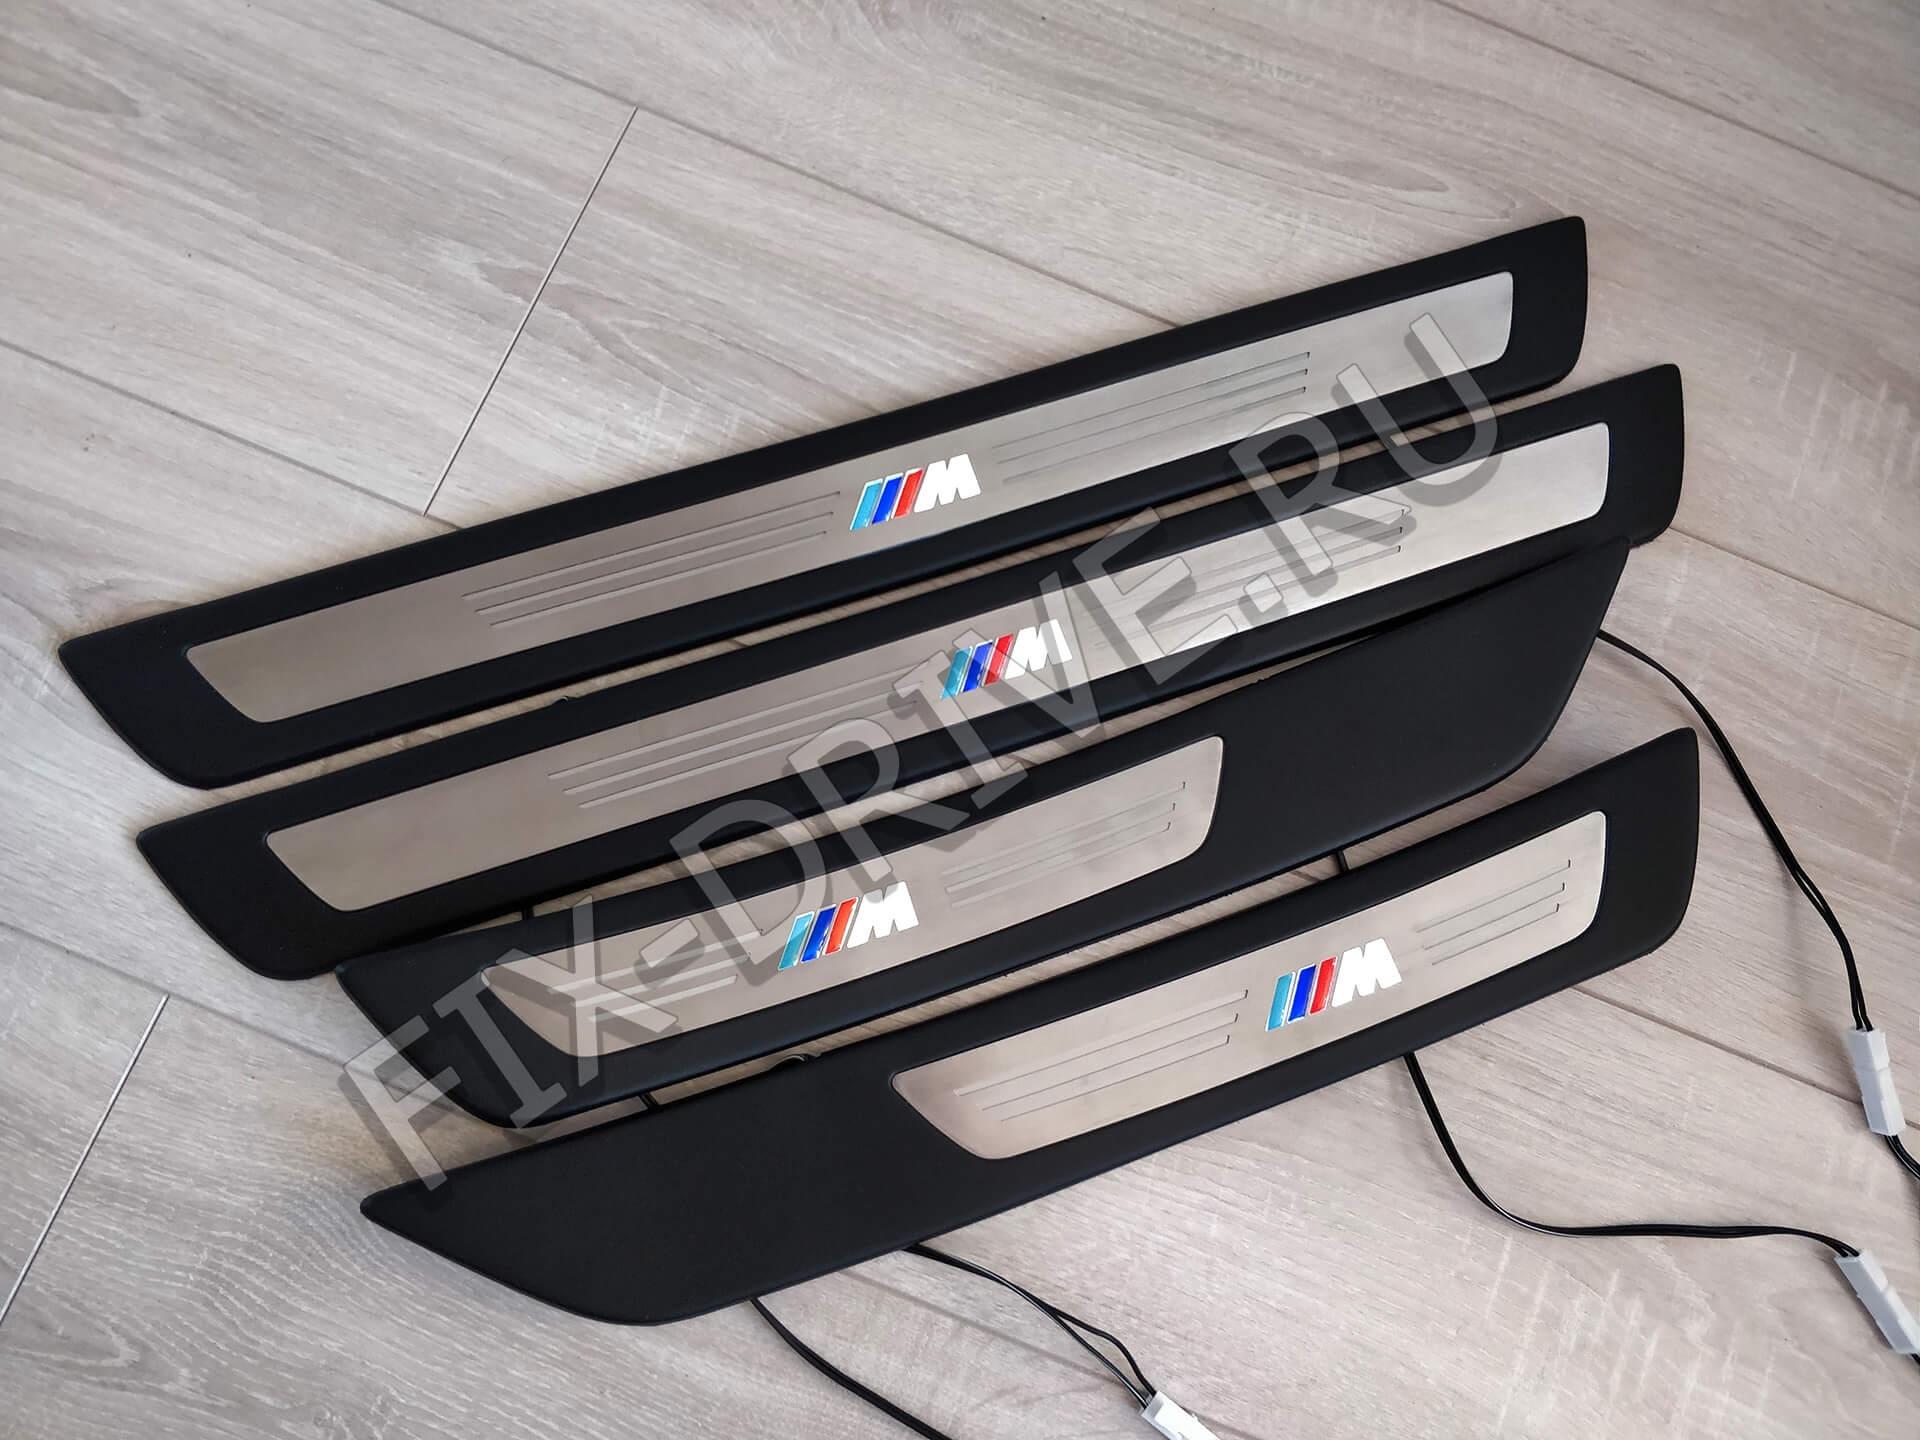 Пороги с подсветкой F10 F11 BMW 5 серия